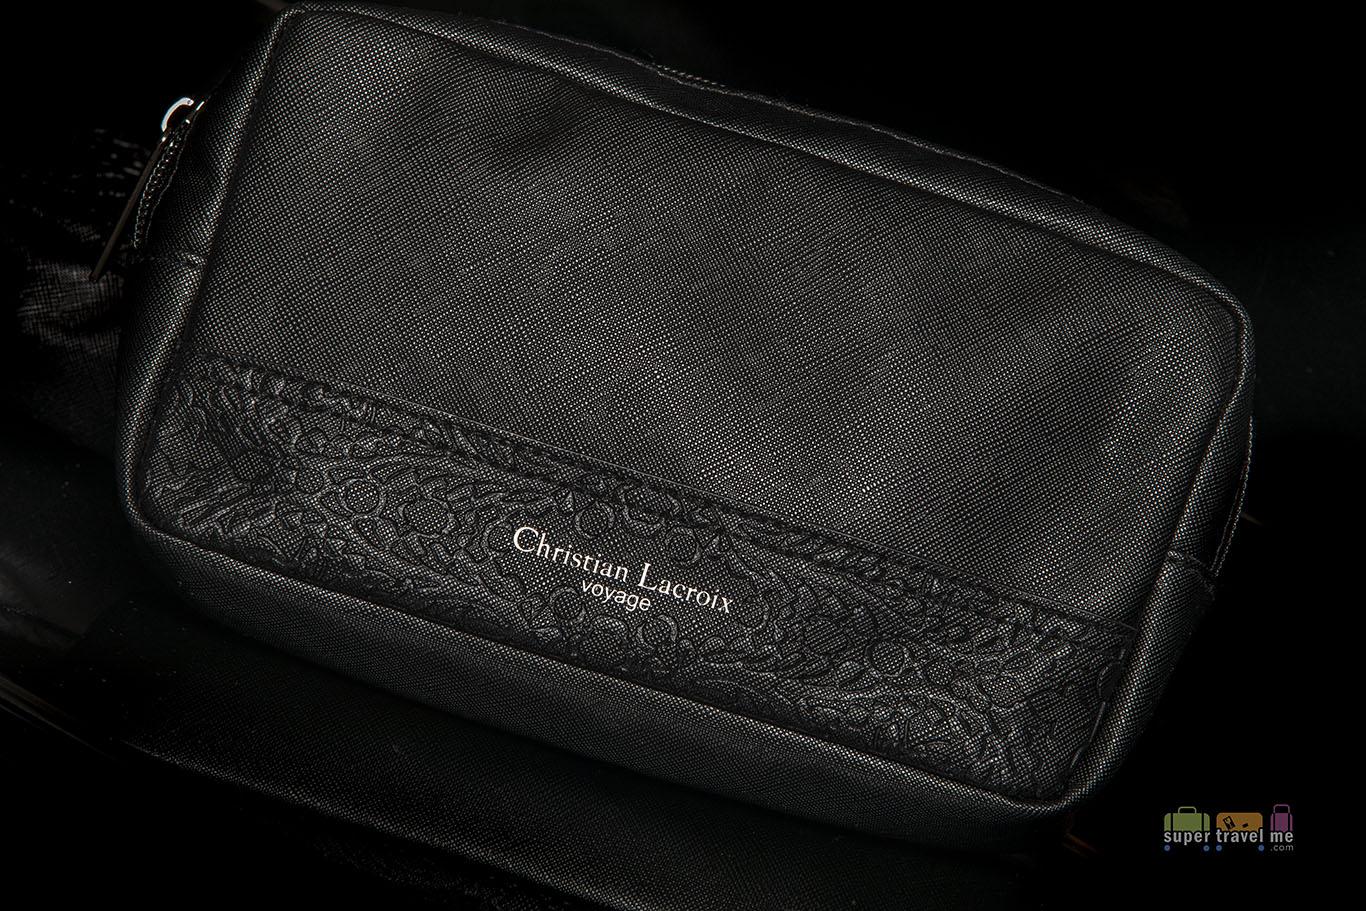 Turkish Airlines Christian Lacroix Voyage amenity kit bag 4318